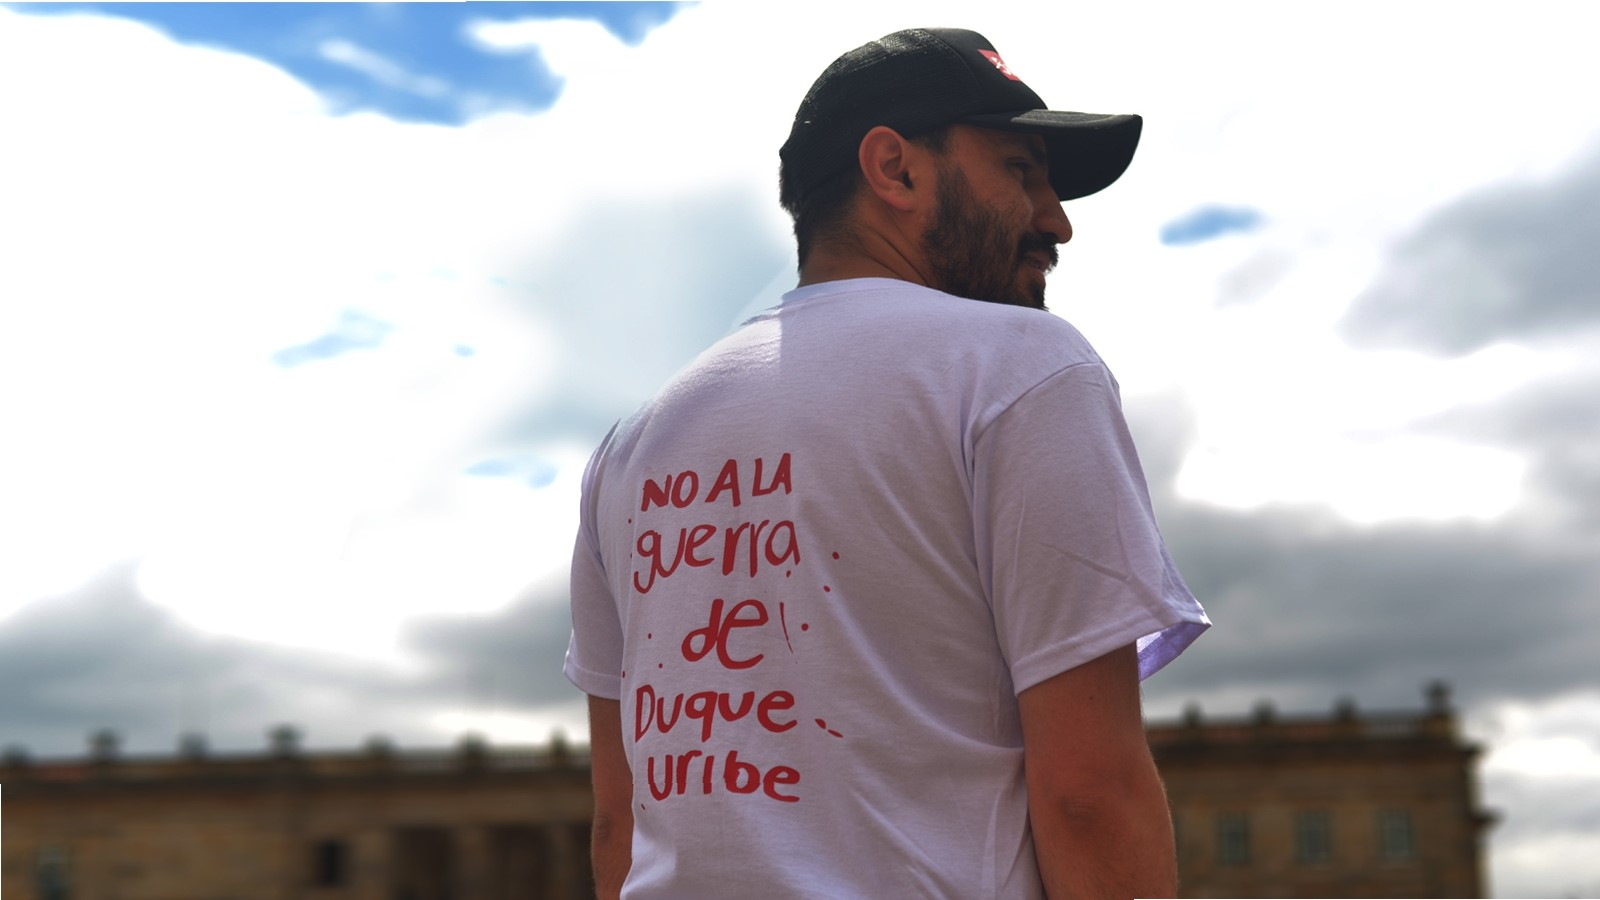 ladob/bogota/camiseta-no-a-la-guerra-de-duque-uribe-